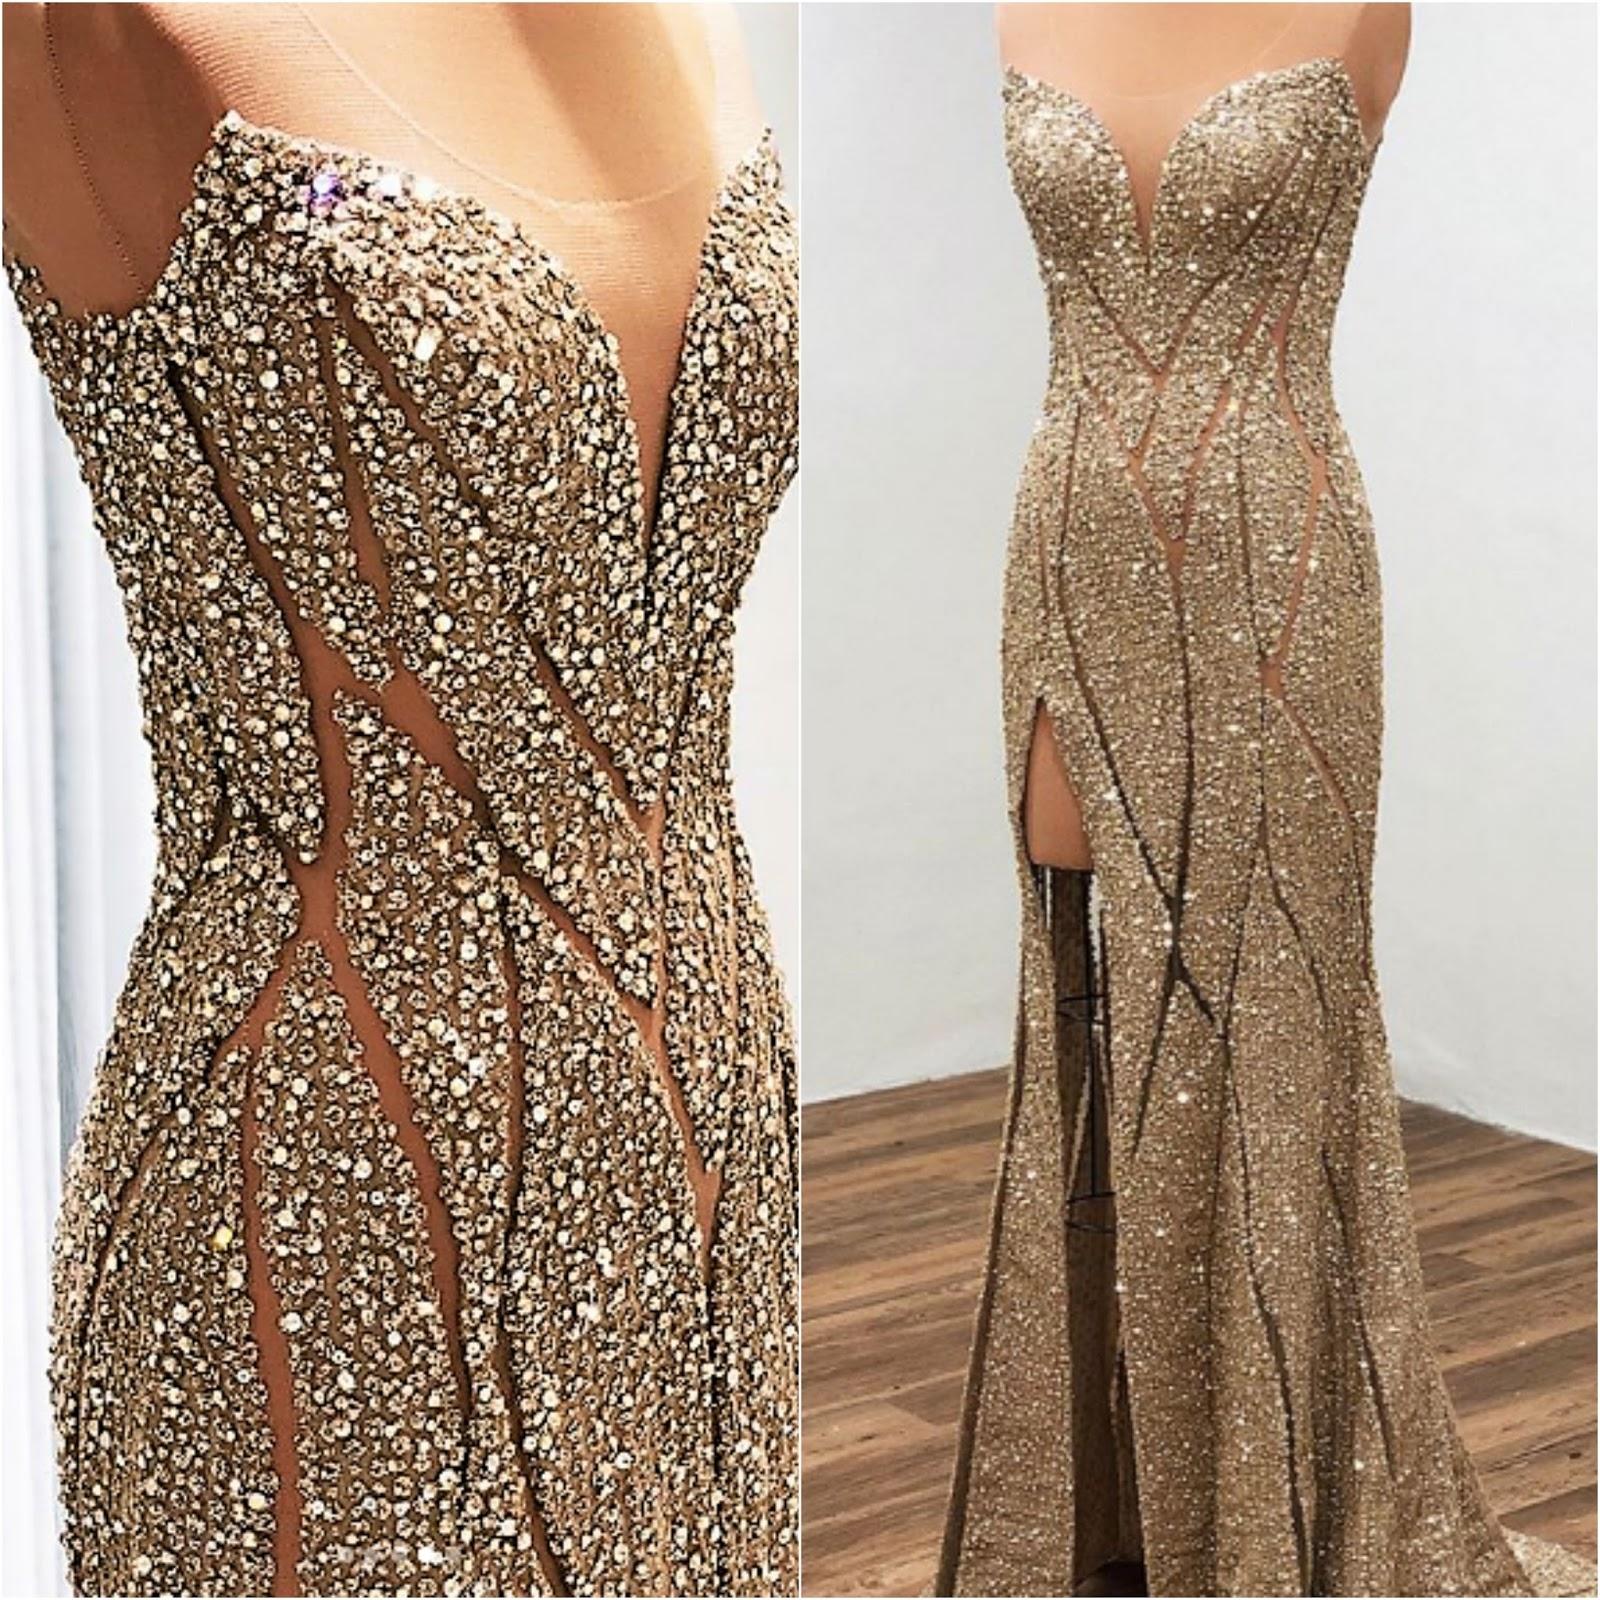 Gray Gold Dress